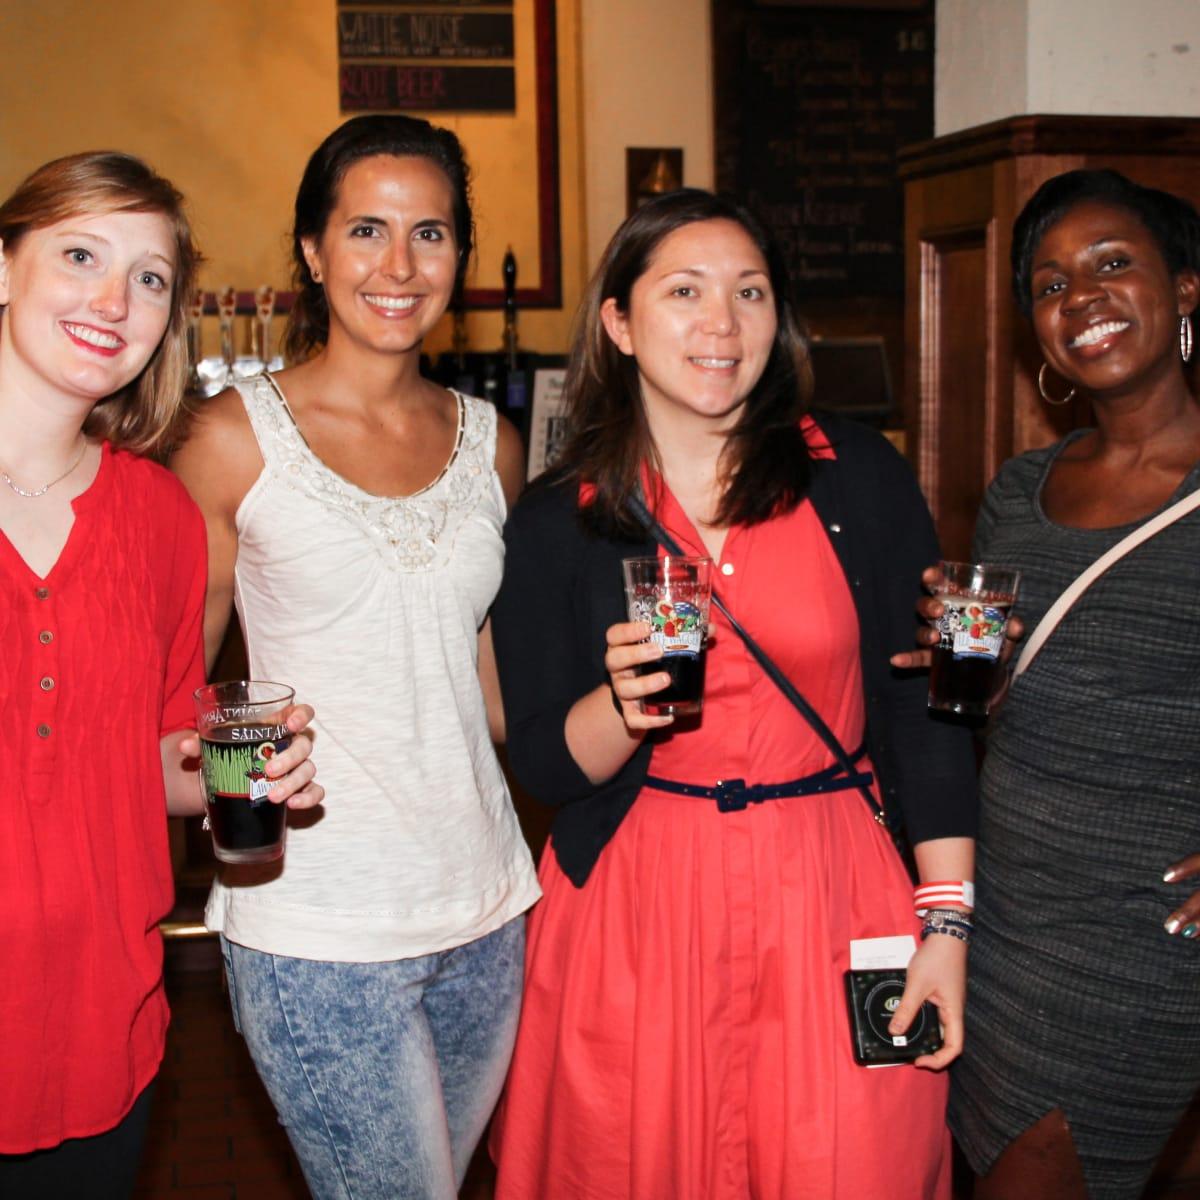 Houston Area Women's Center Young Leaders 7/16  Kate Goldsberry, Gaby Donatti, Lindsay Calvert, Shaneka Smith